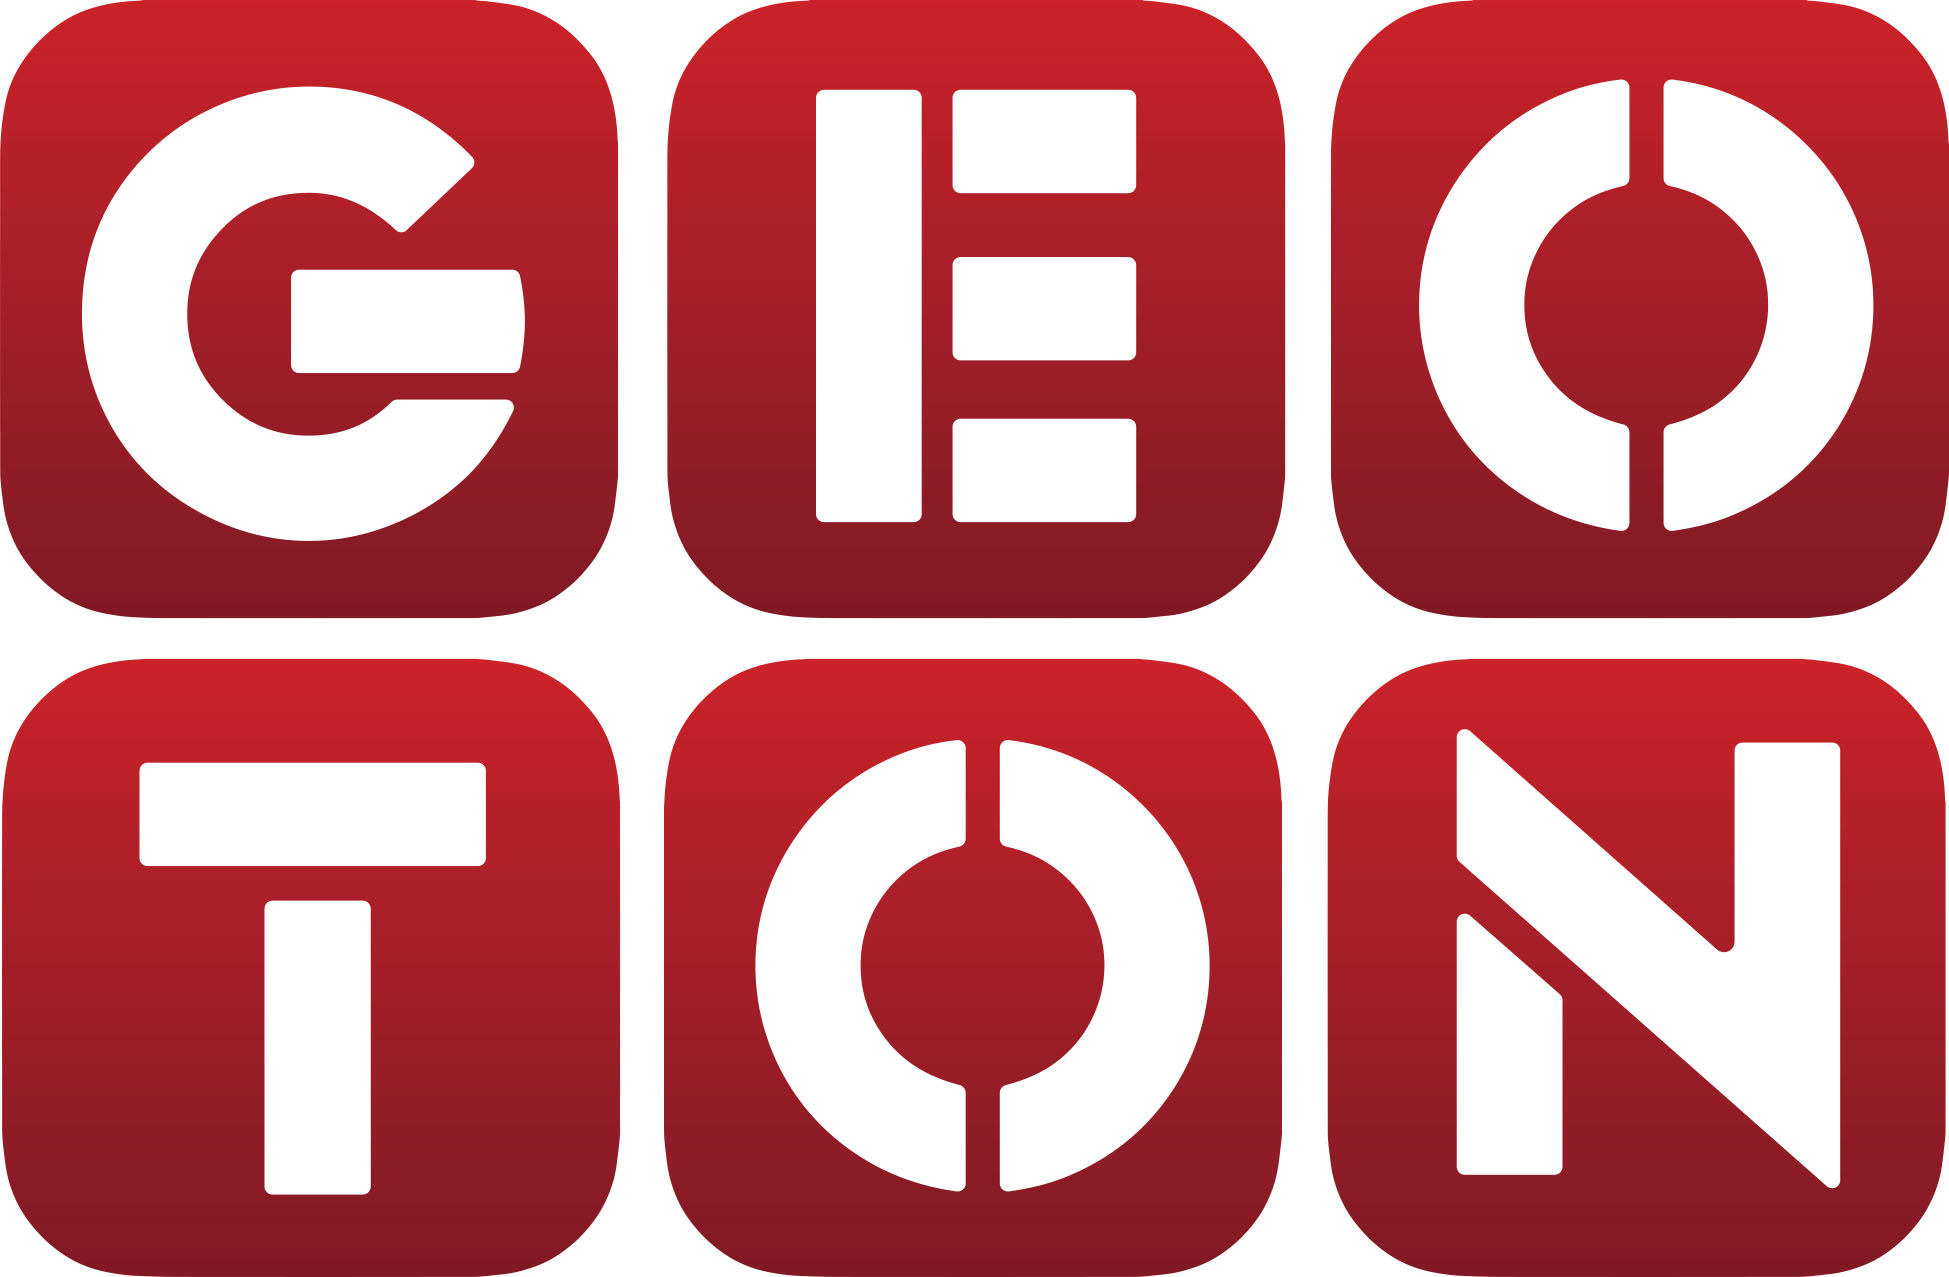 Geoton CZ s.r.o.